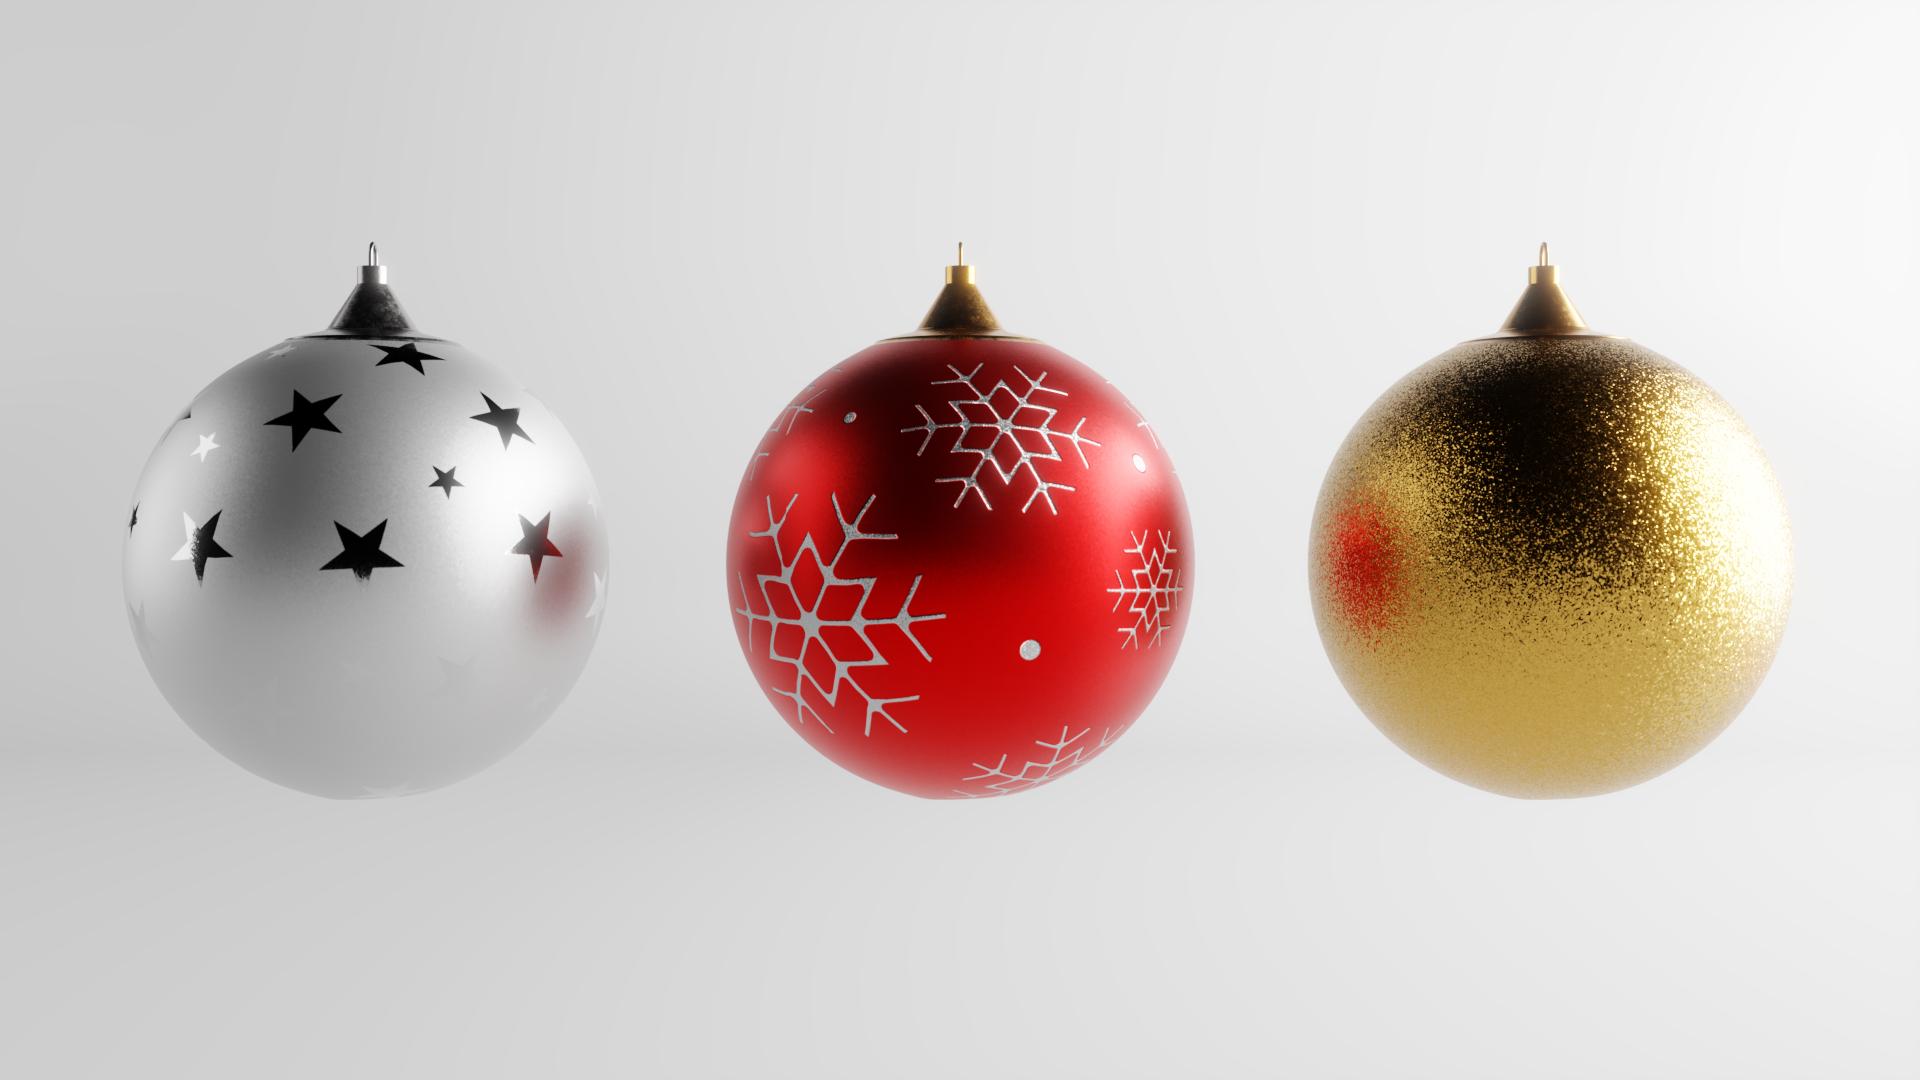 Christmas Decoration Assets Christmas Decorations Christmas Balls Christmas